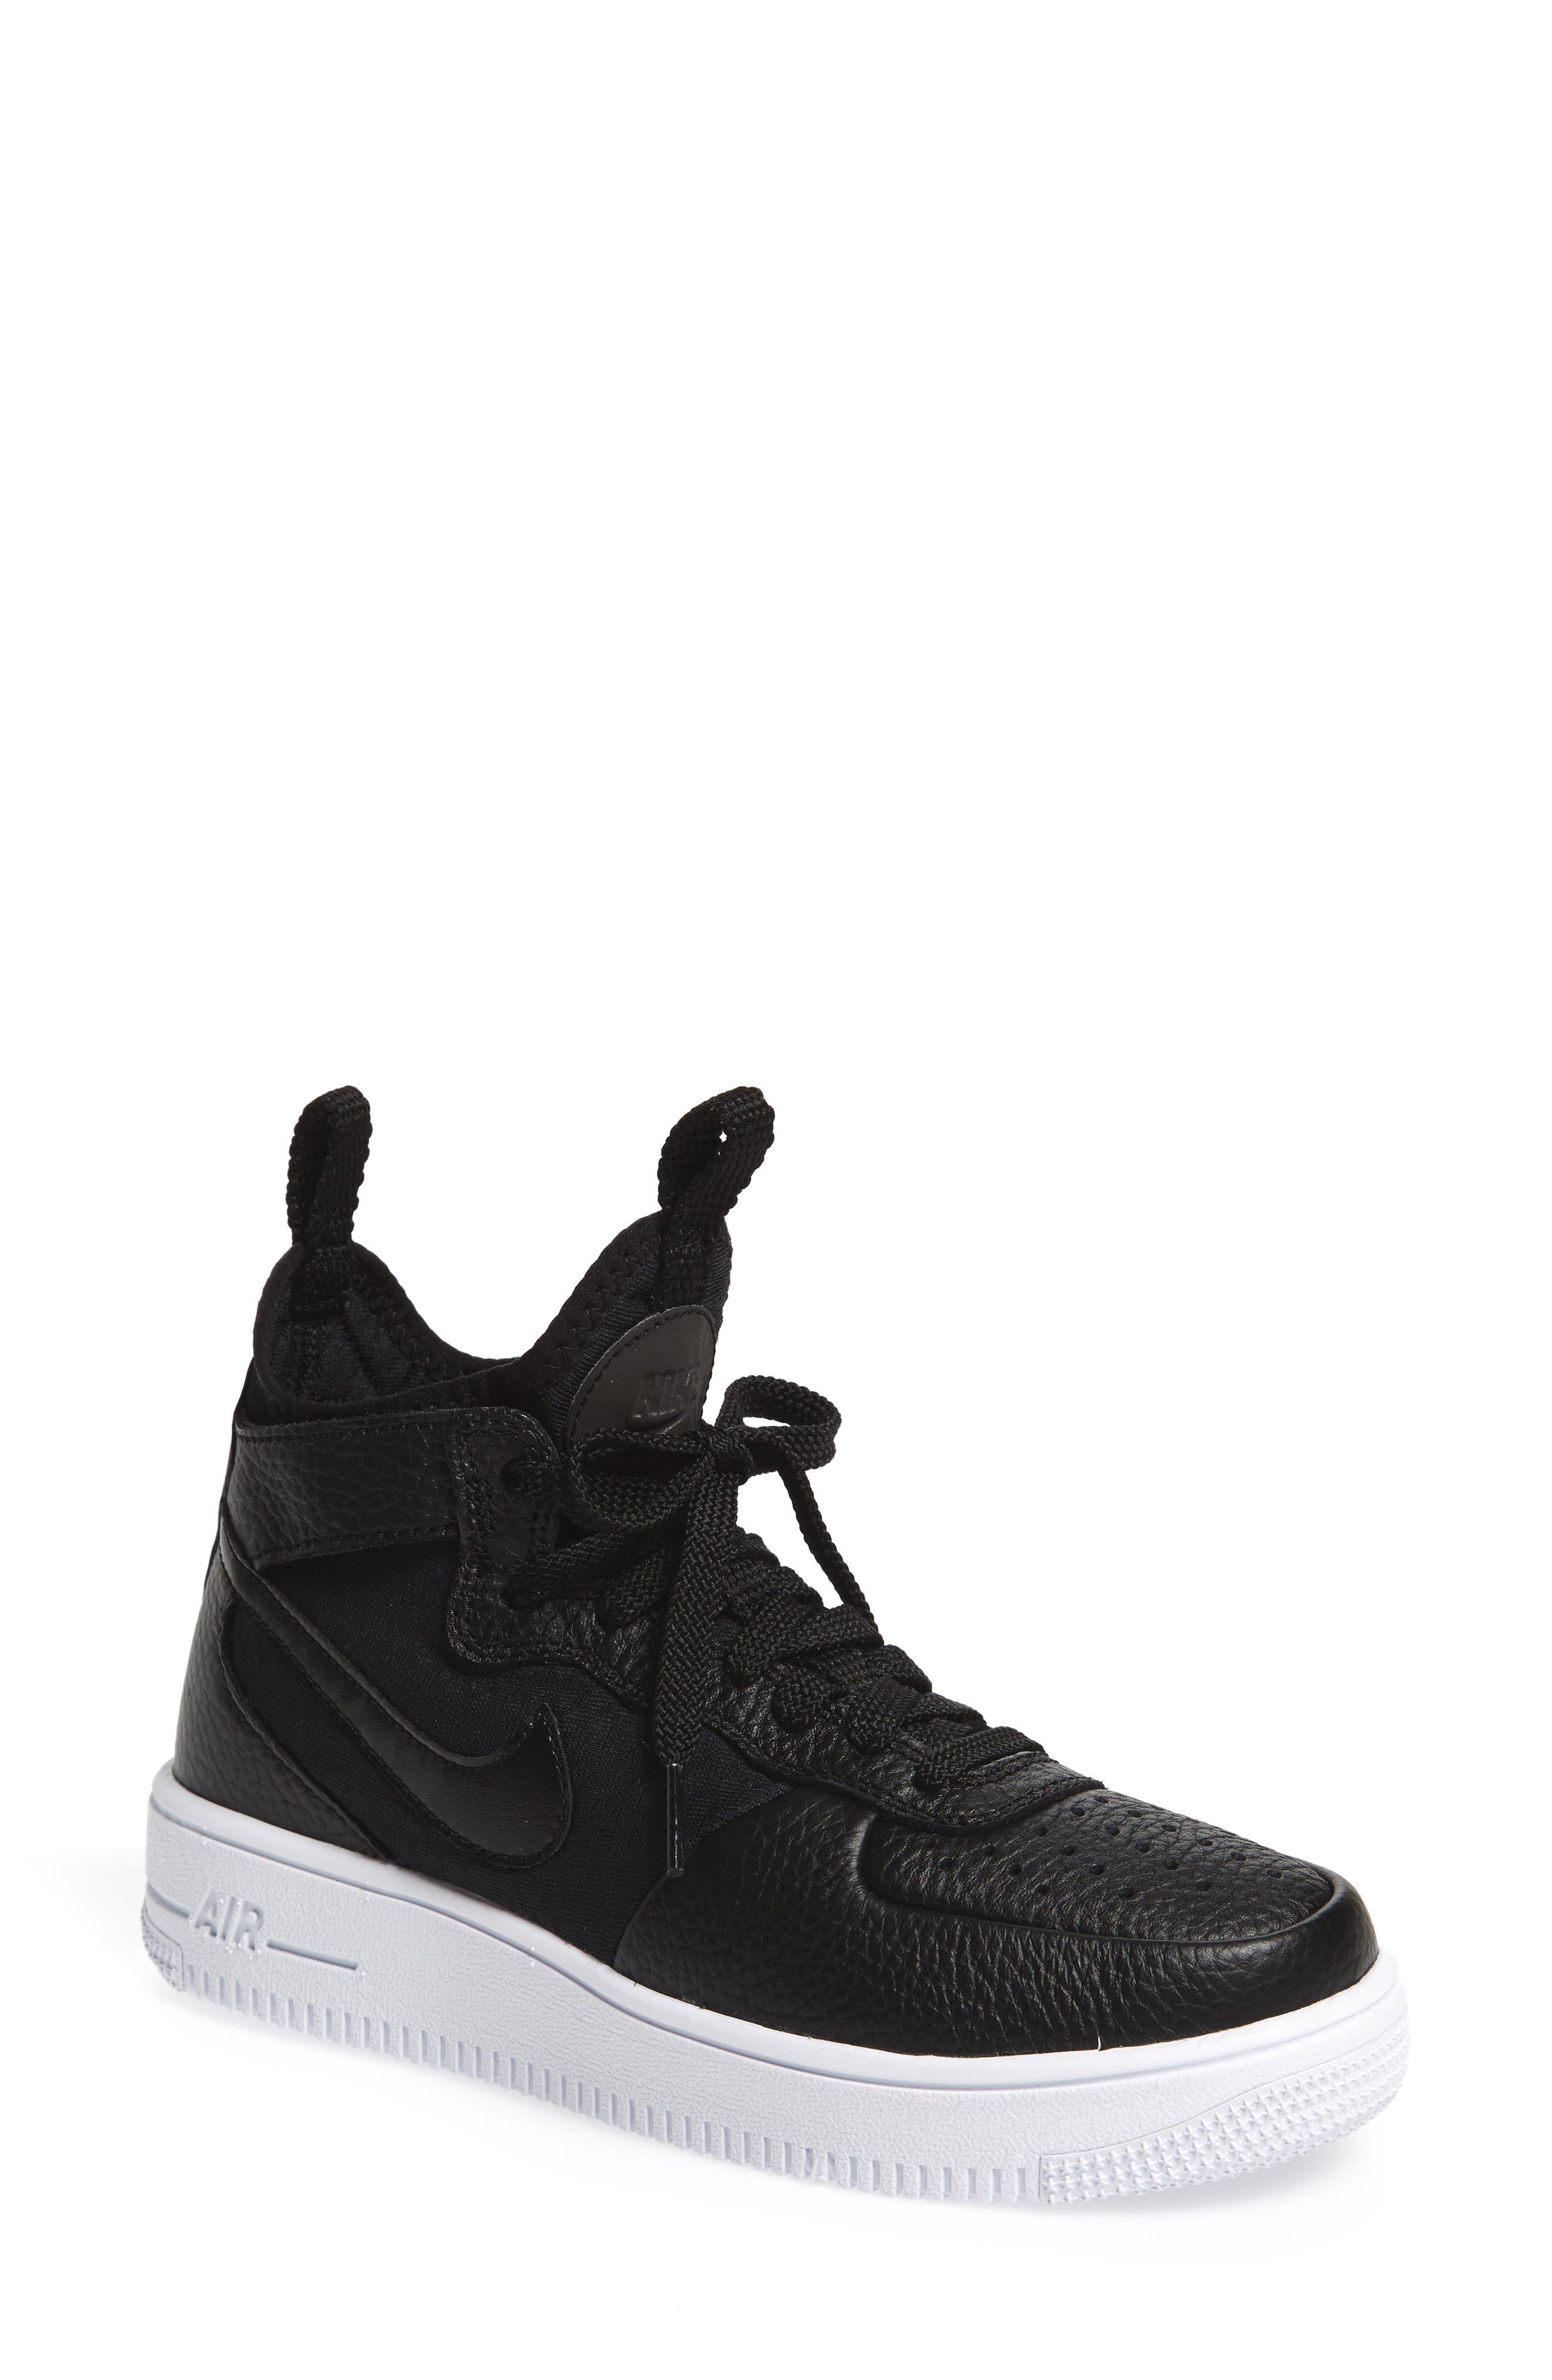 Air Force 1 Ultraforce Mid Sneaker,                         Main,                         color, Black/ Black